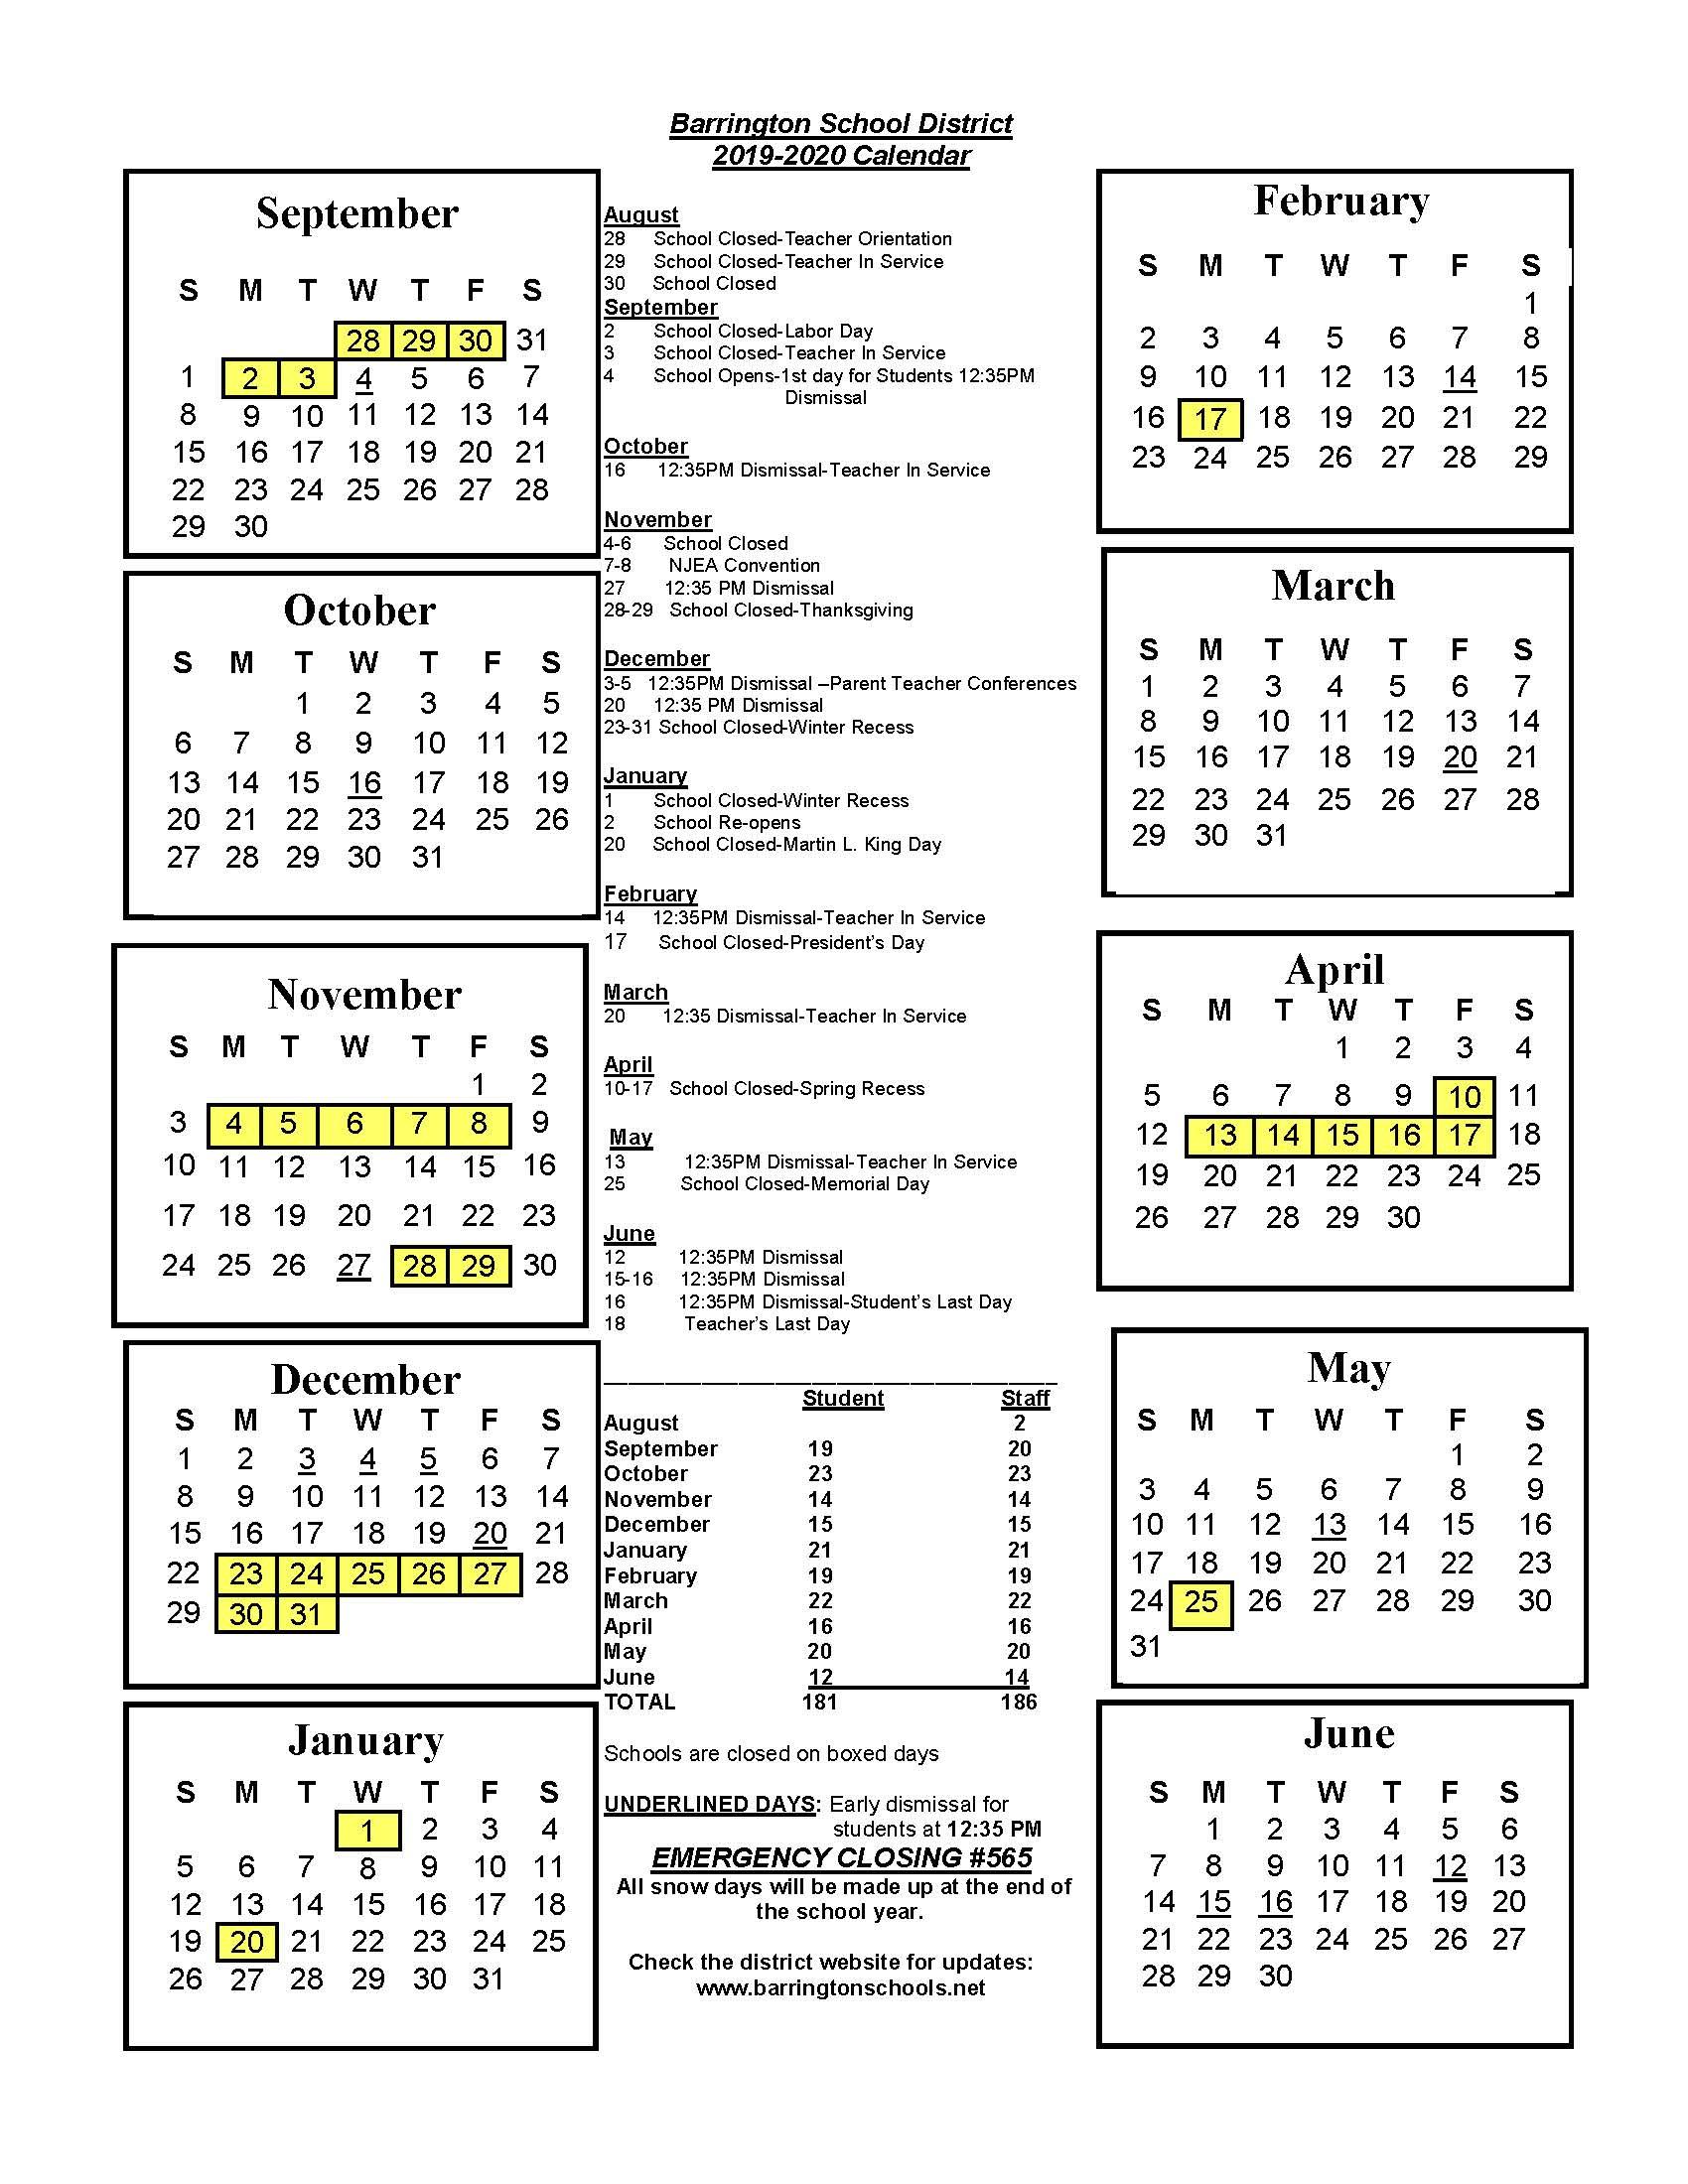 District Calendar - Barrington School District intended for Boyertown School Calander